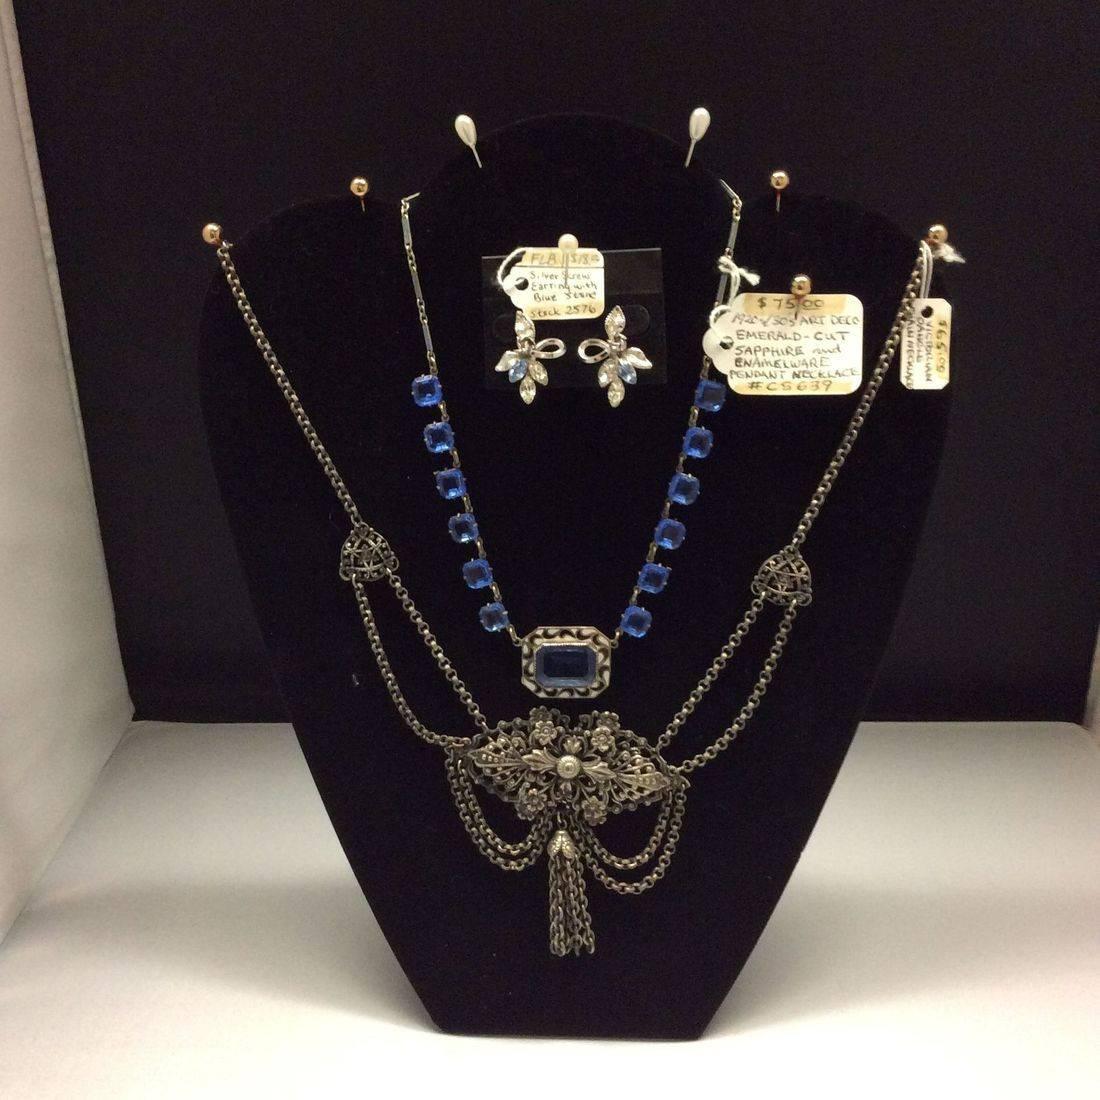 Vin. Silver Earrings w/Blue Stones  $18,  1920's/30's Deco, Sapphire Necklace  $75,  Victorian Dangle, Chain Necklace  $65.00.